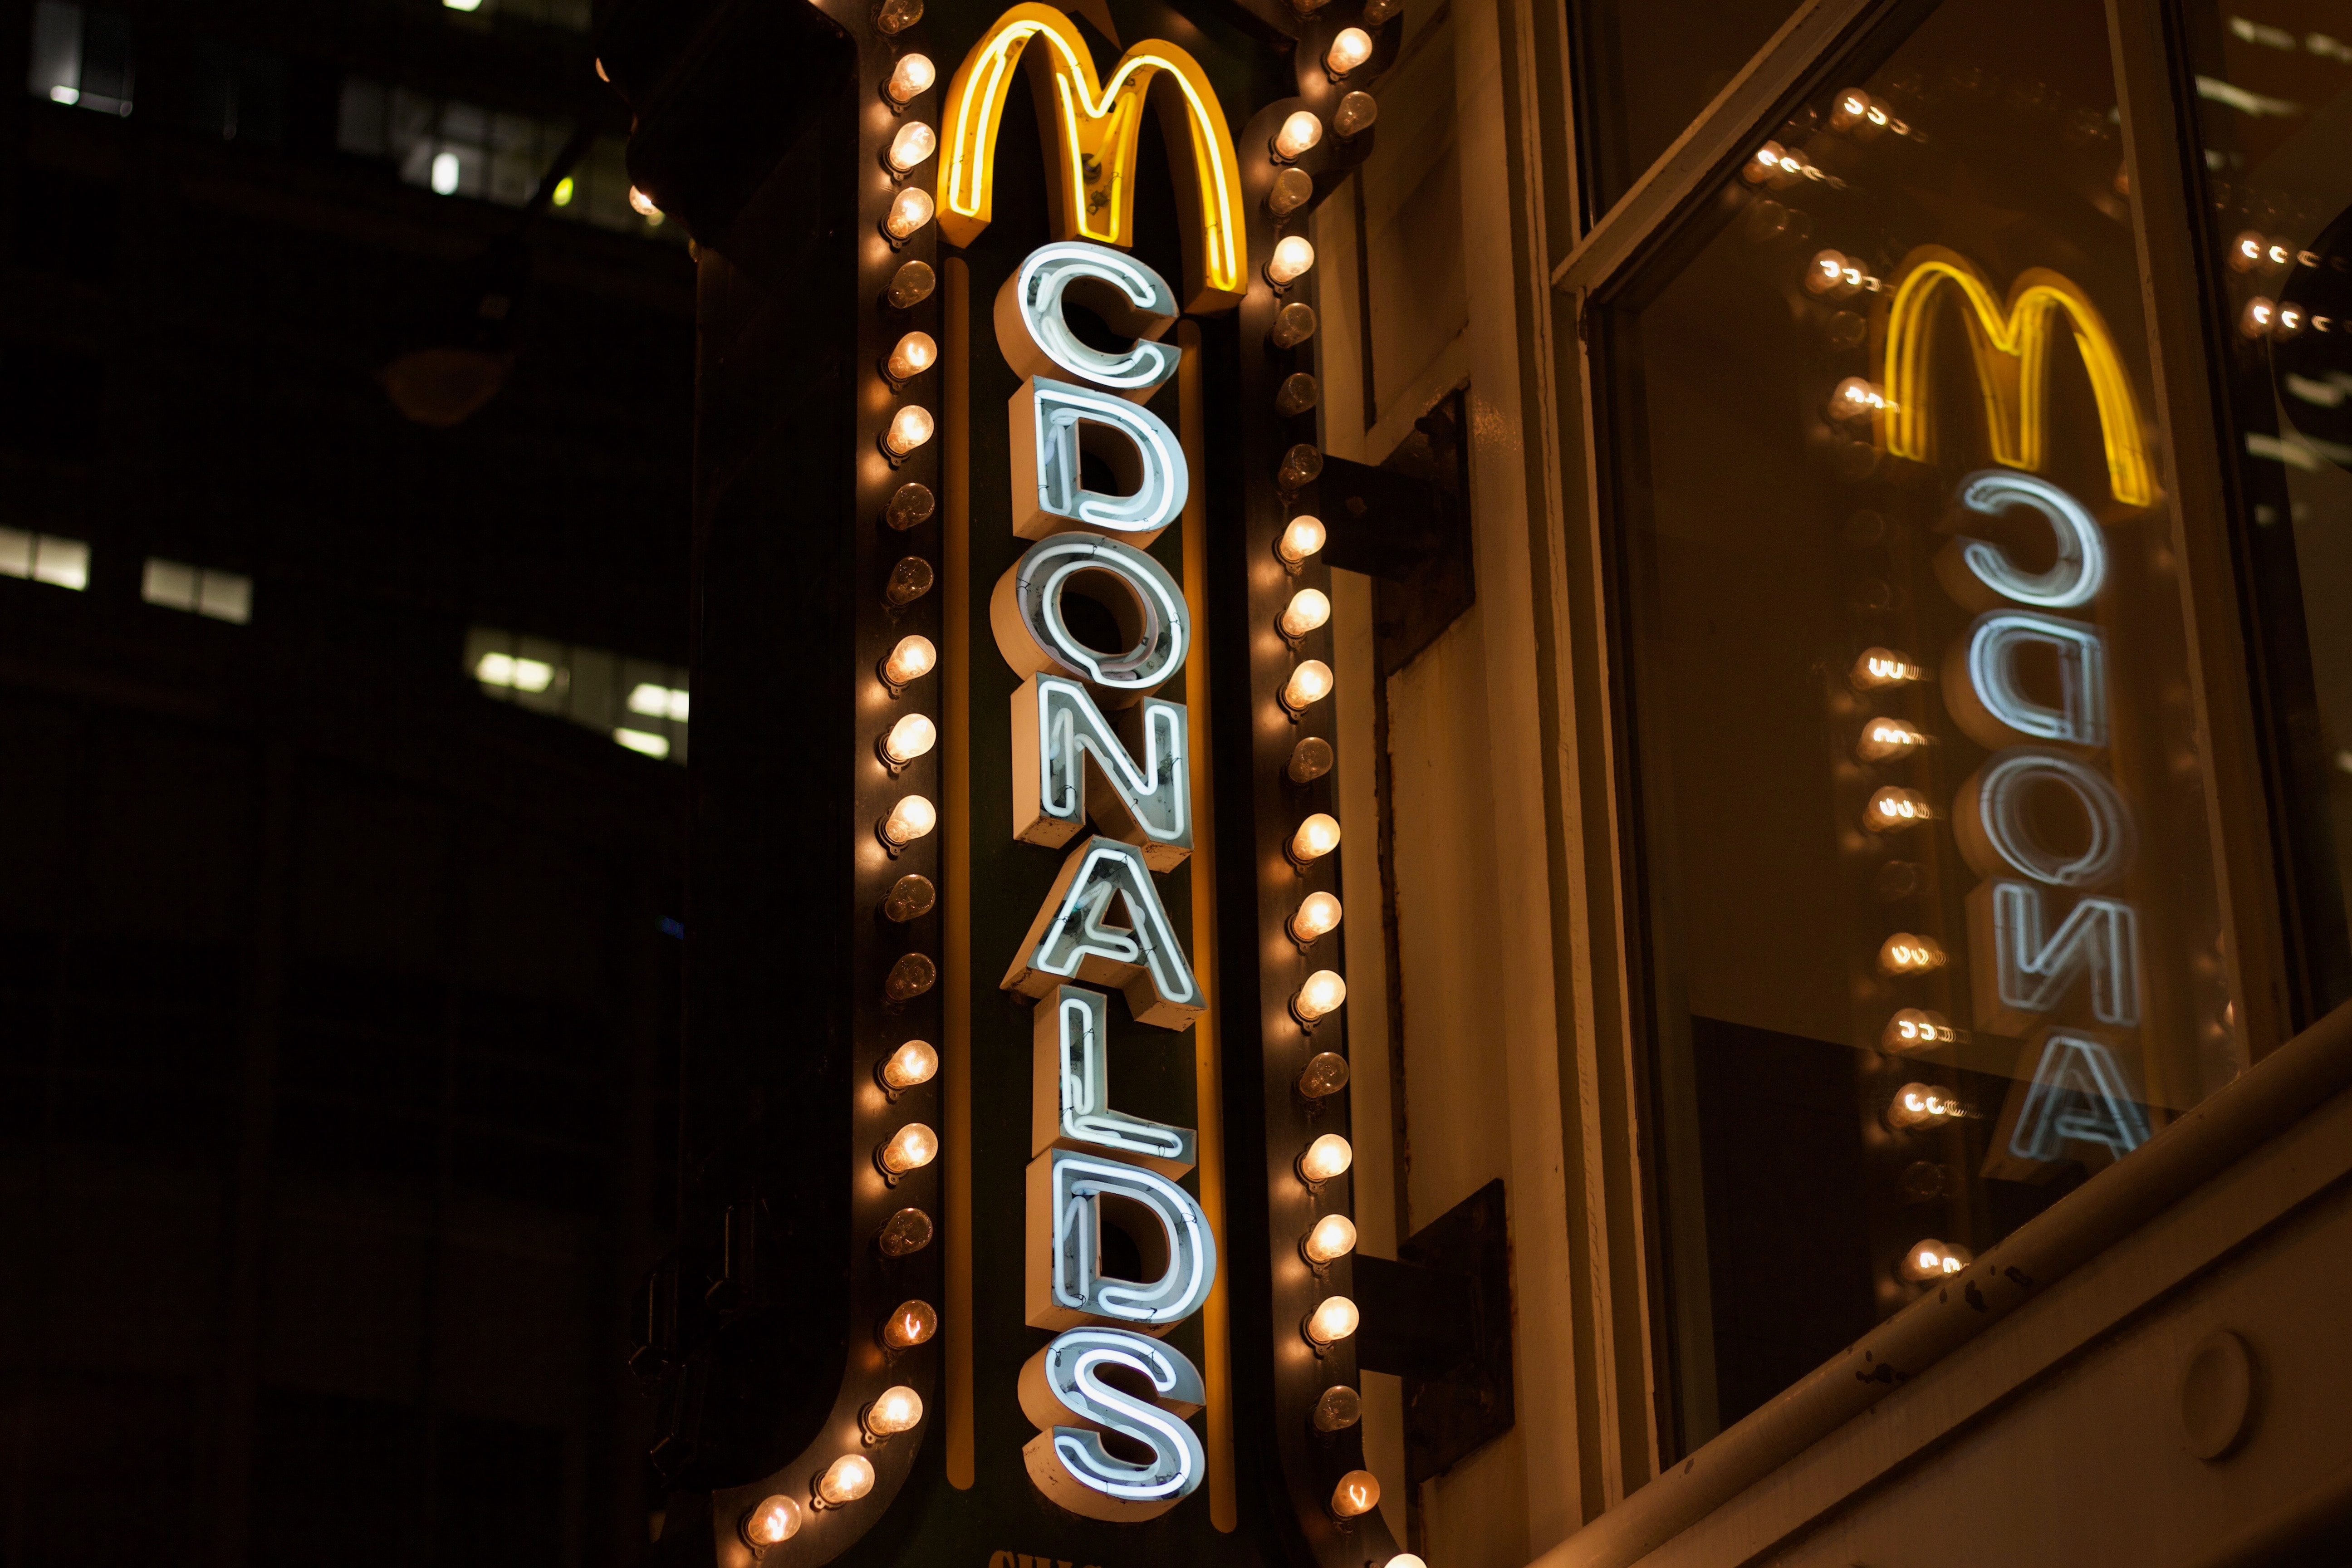 McDonald's Acquires Voice Technology Startup Apprente